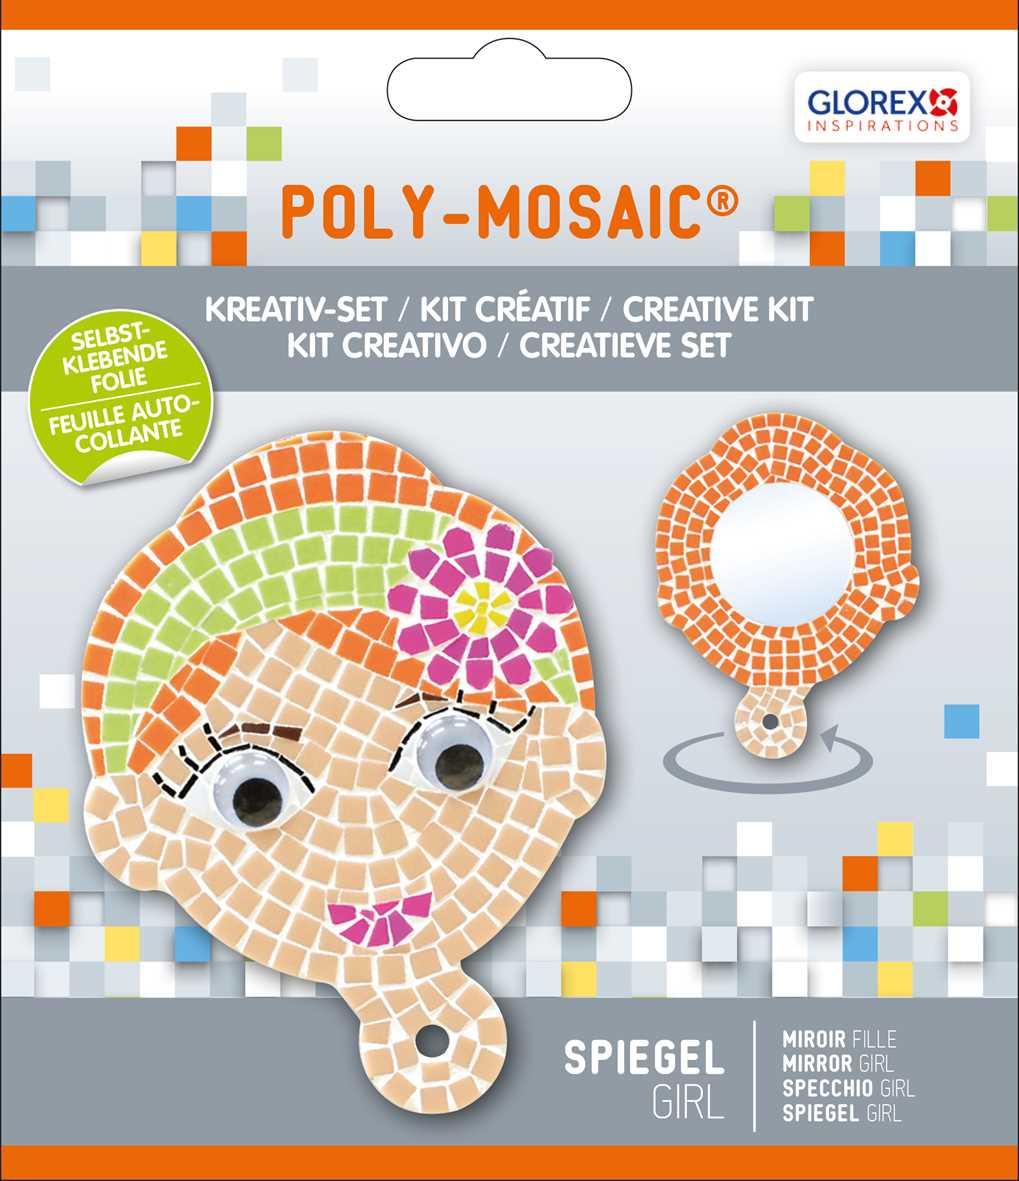 Kreativ set selbstklebendes poly mosaik spiegel girl 41141 mosaik shop selbstklebendes mosaik - Mosaiksteine spiegel ...